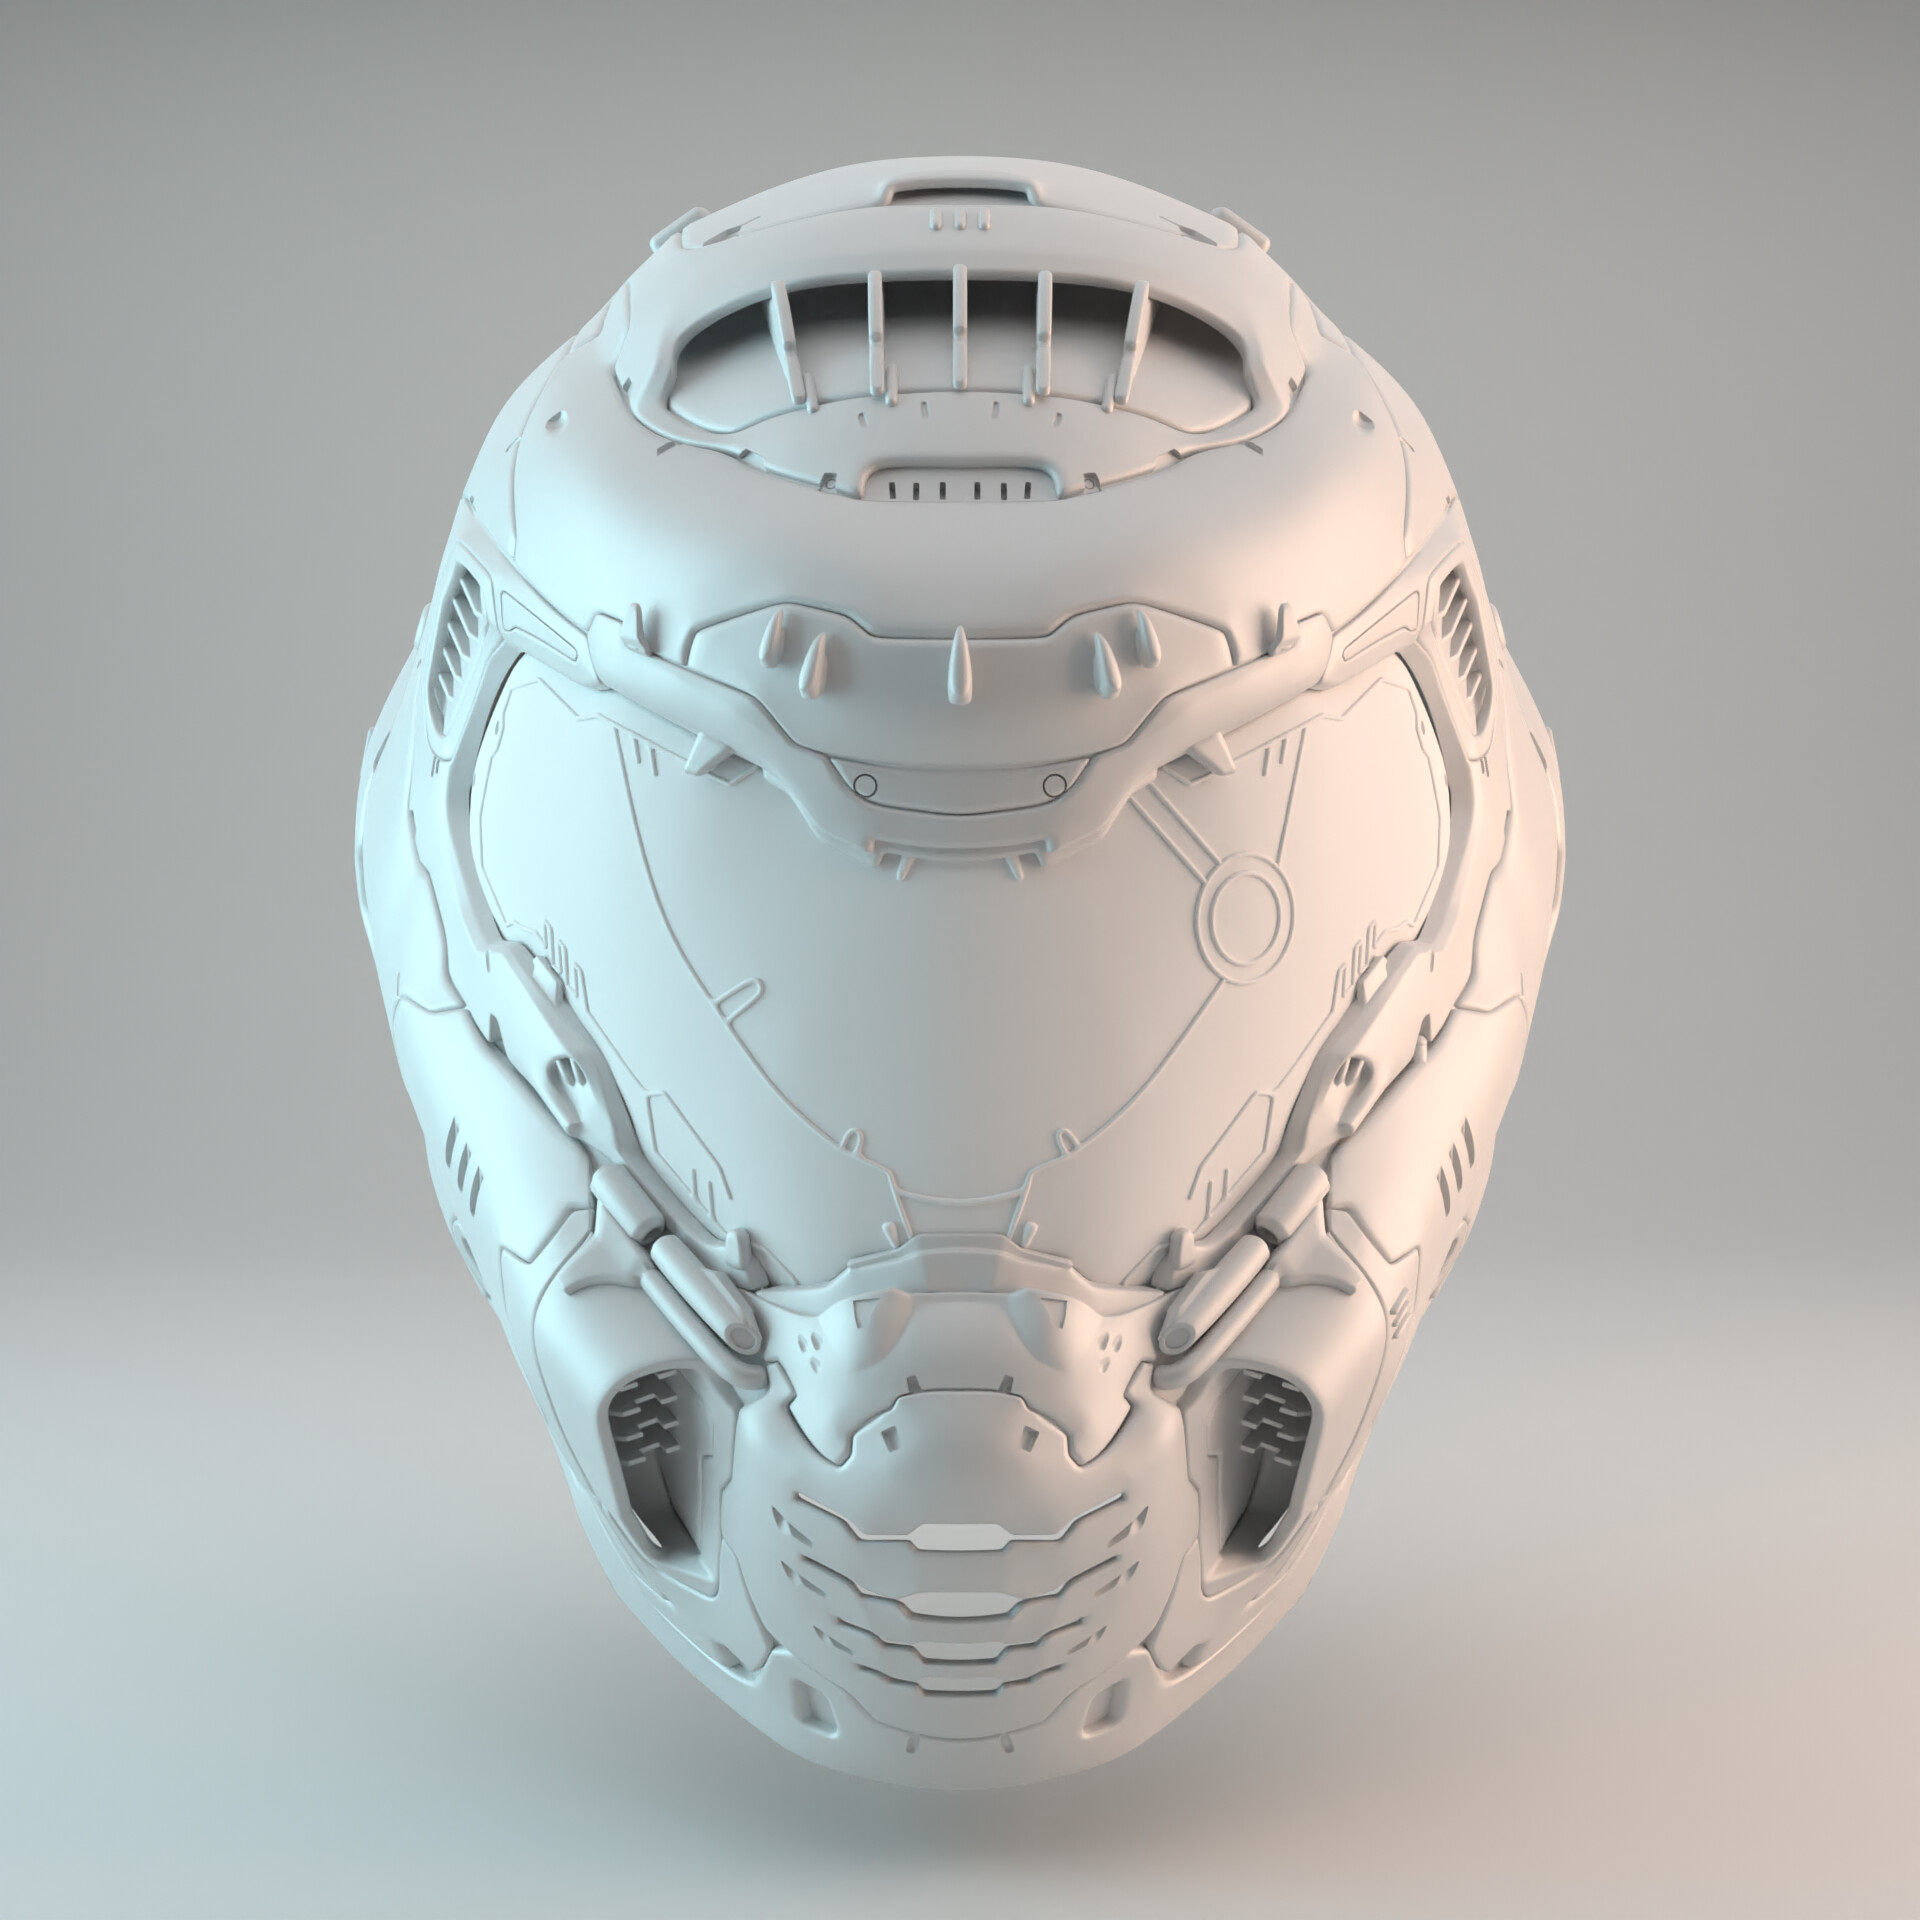 Artstation Doom Slayer Helmet 3d Print Model Doom Eternal